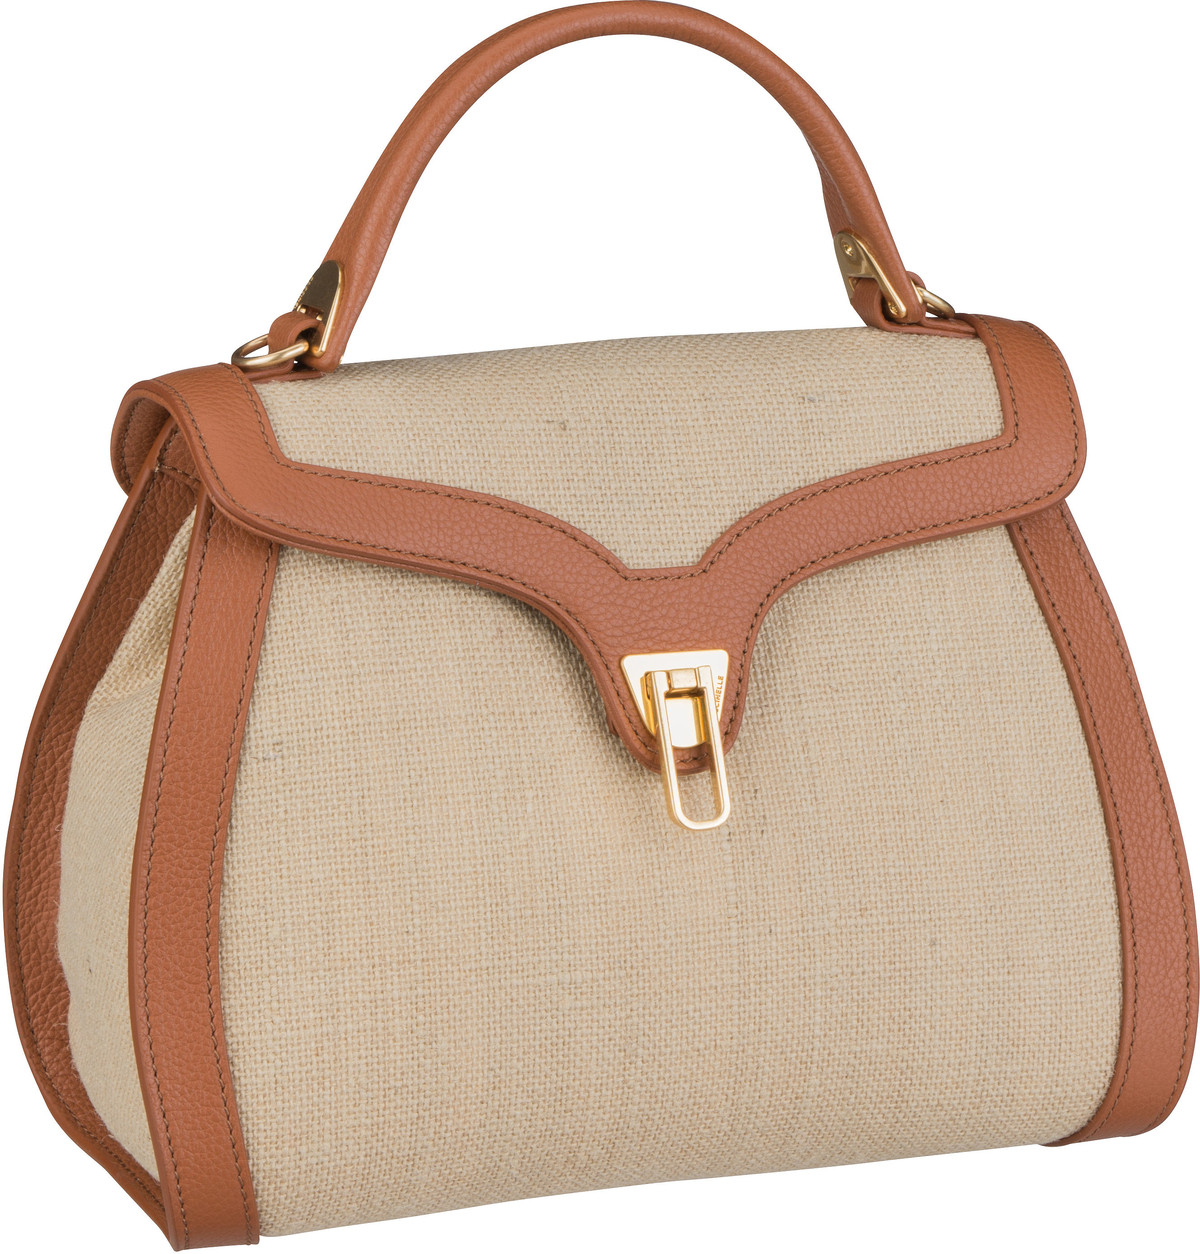 Handtasche Marvin Juta 1803 Natural/Tan